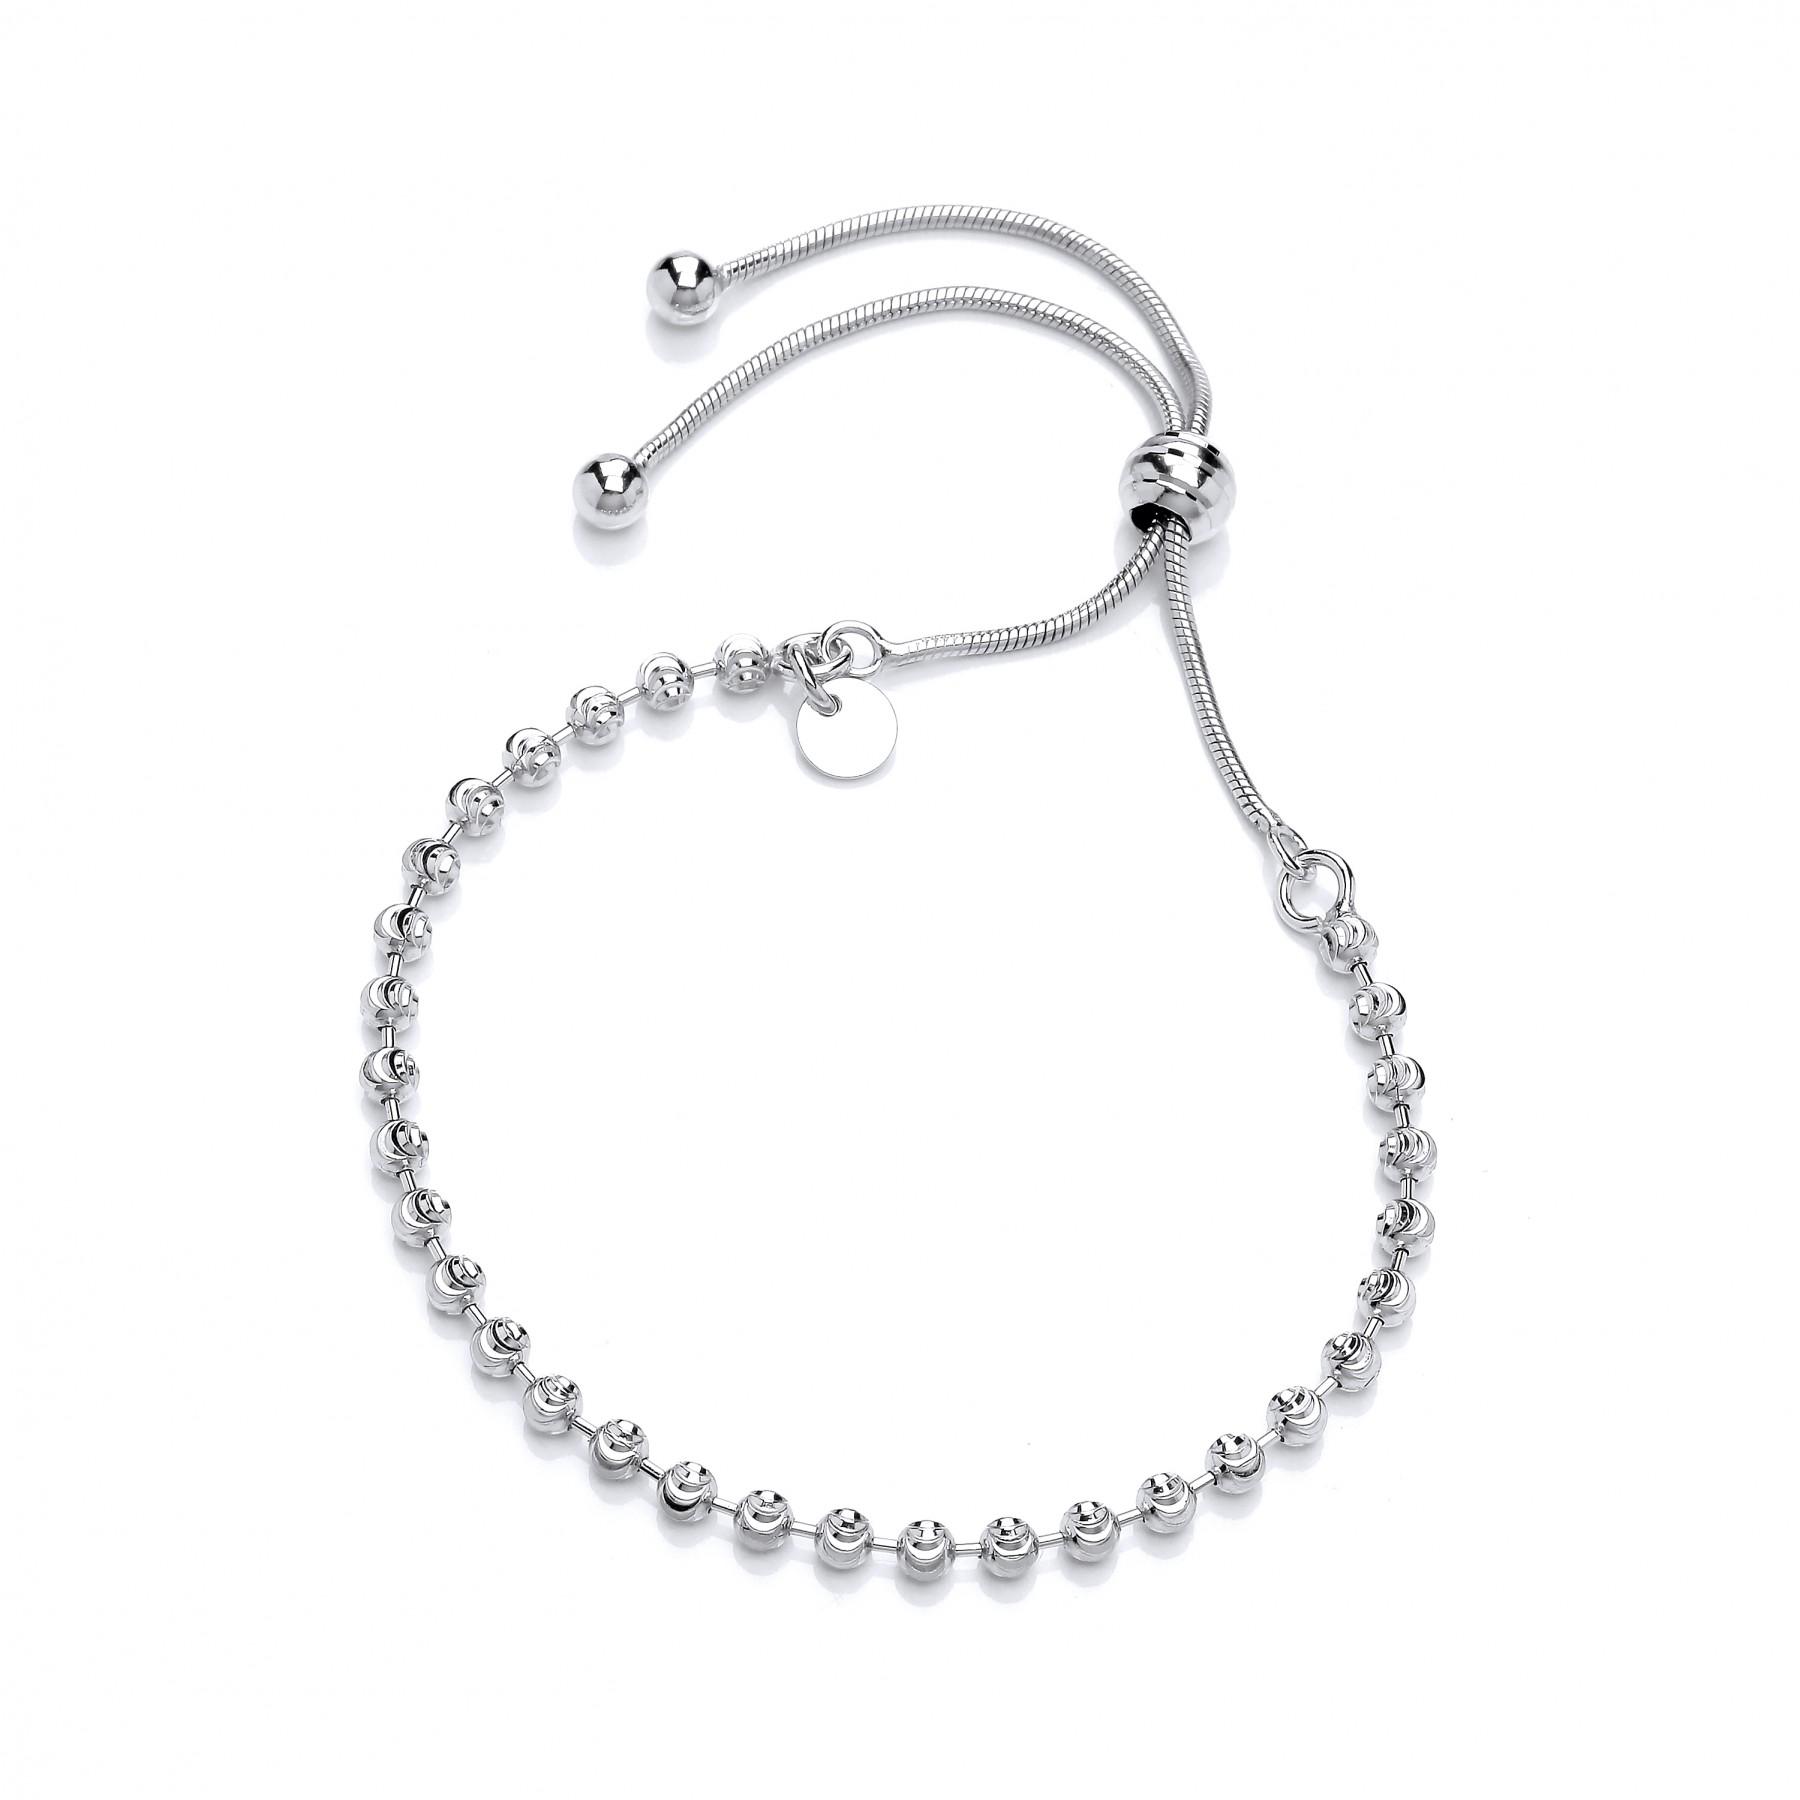 Silver Friendship Bracelet